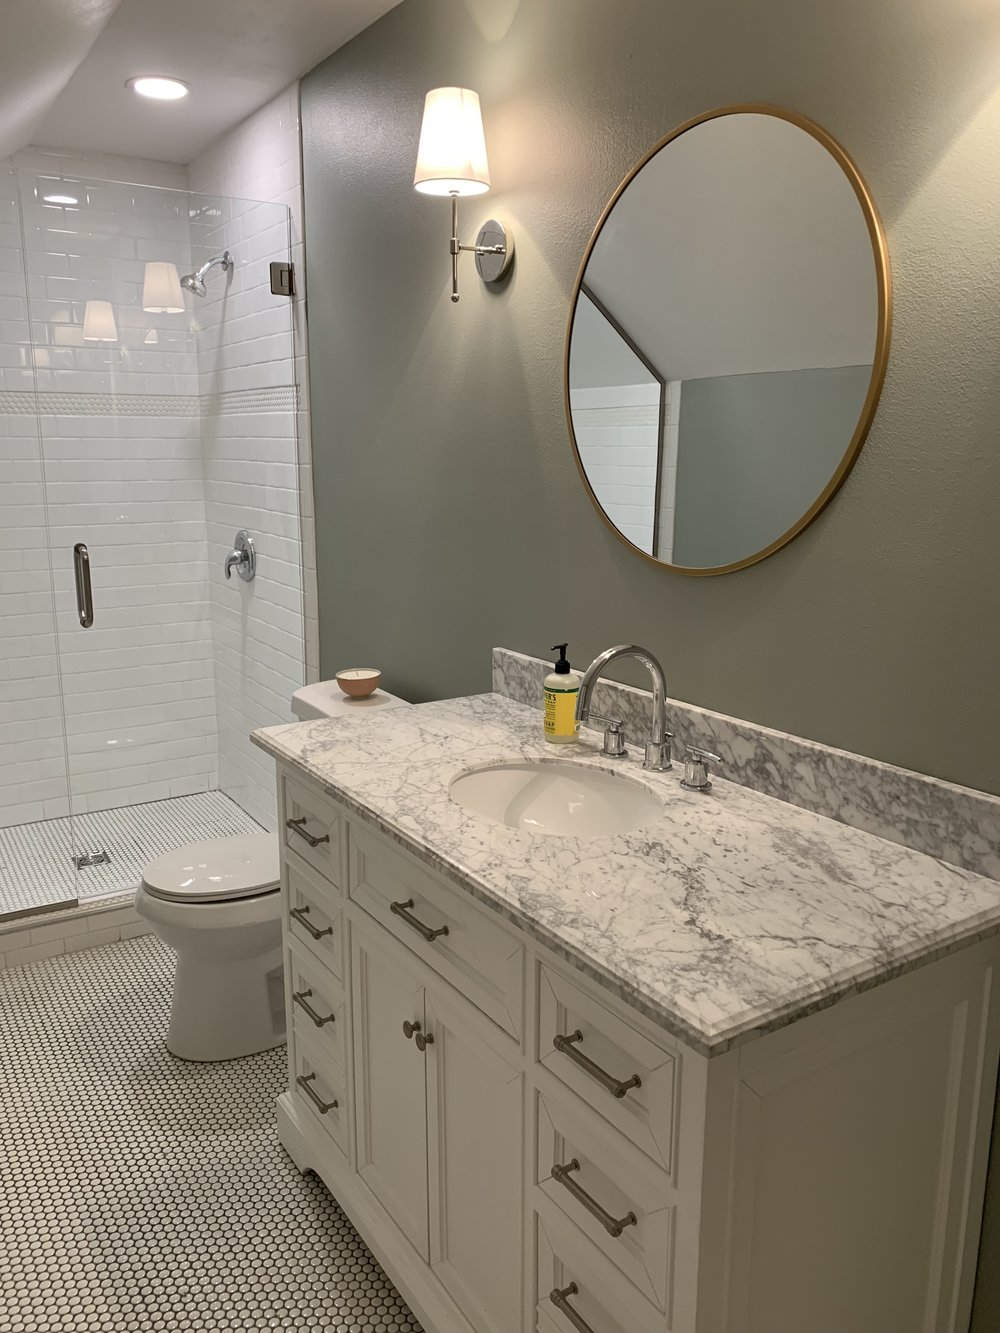 Upstairs renovated bathroom